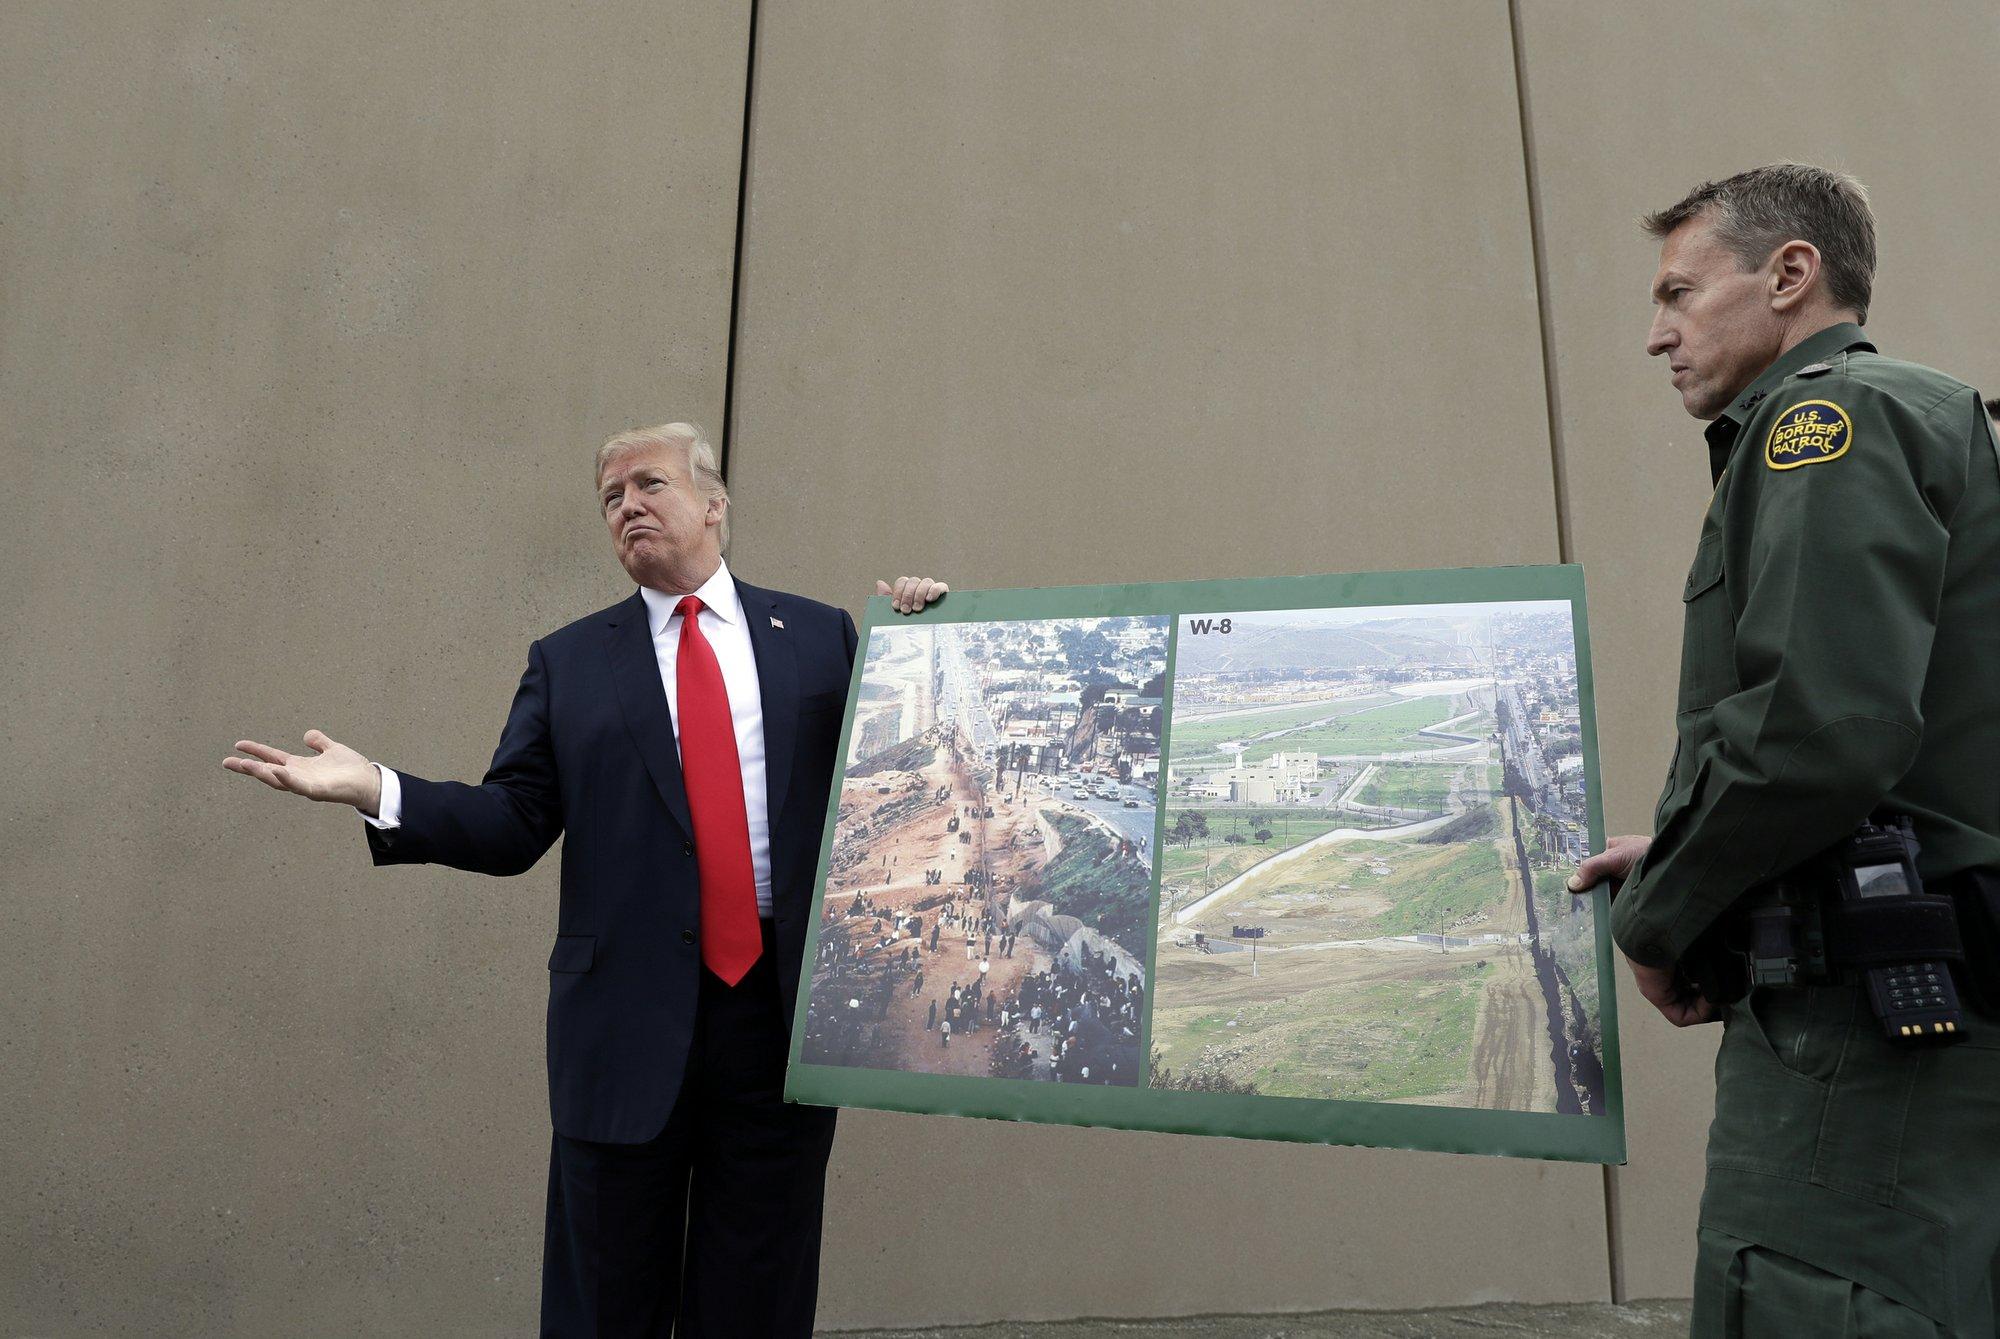 4 senators push resolution to halt Trump's border emergency